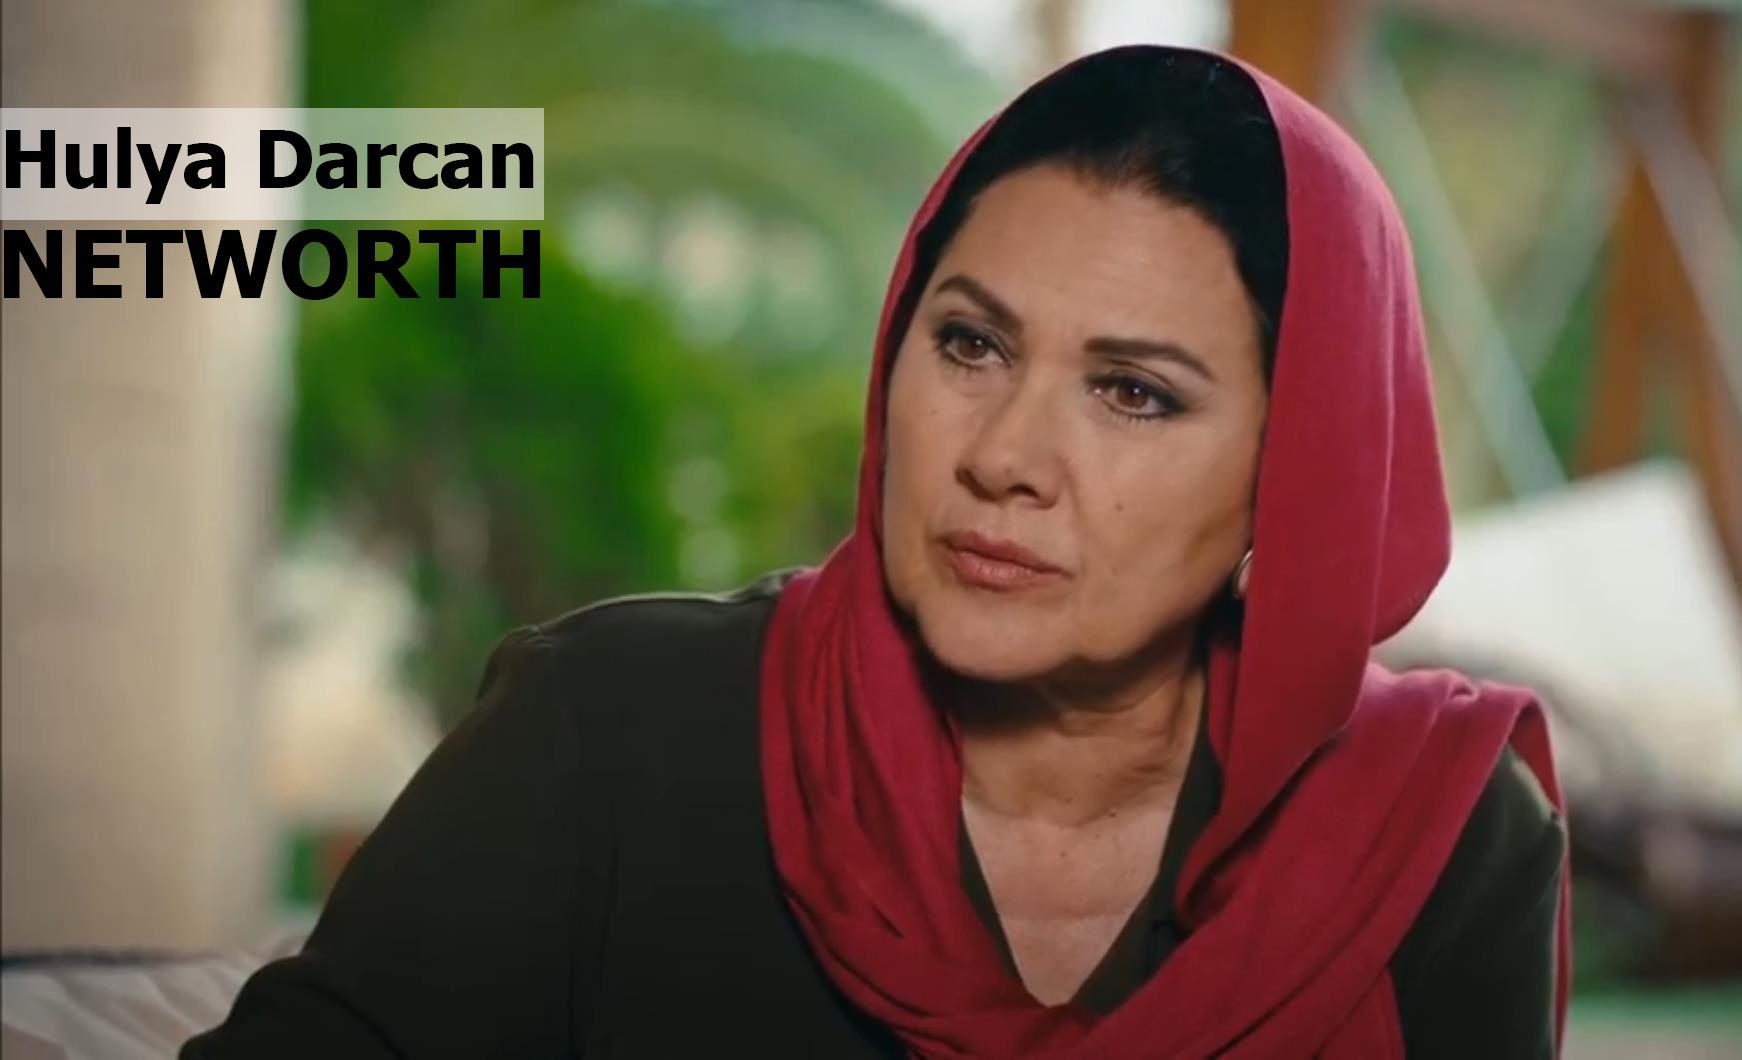 Hulya Darcan Net Worth